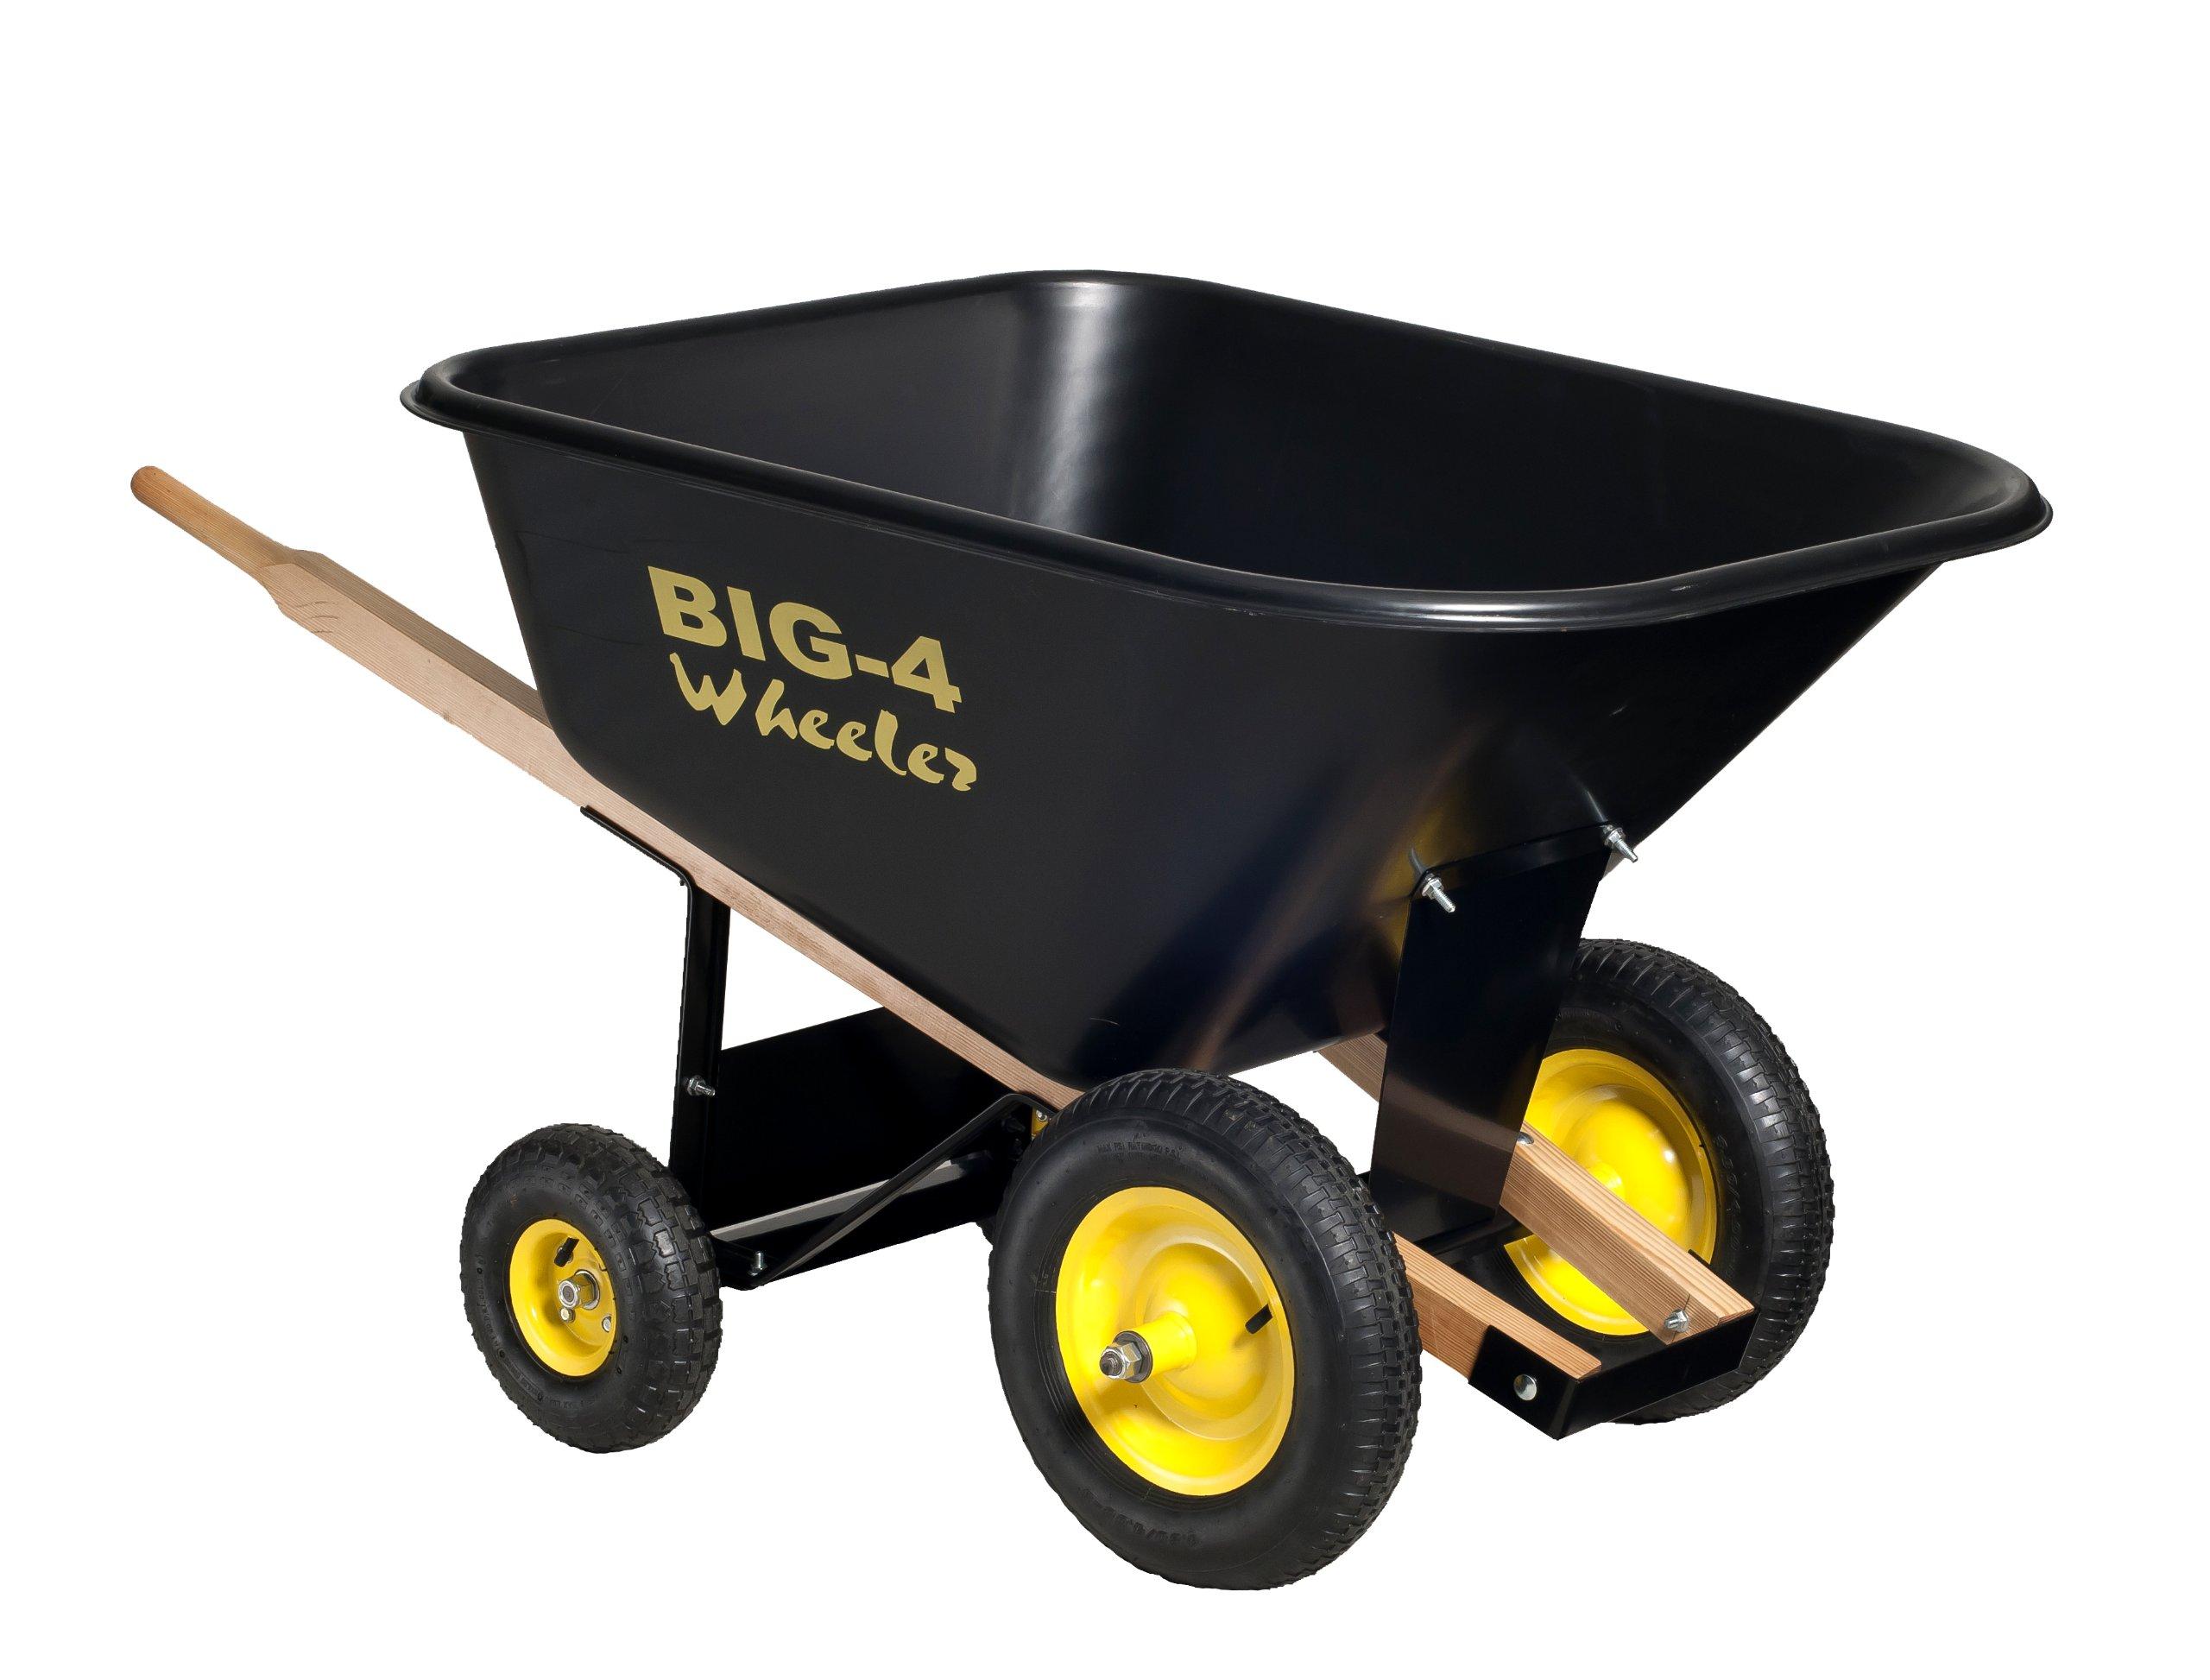 Big 4 Wheeler Heavy Duty Wheelbarrow, 10 Cubic Feet by Big 4 Wheeler